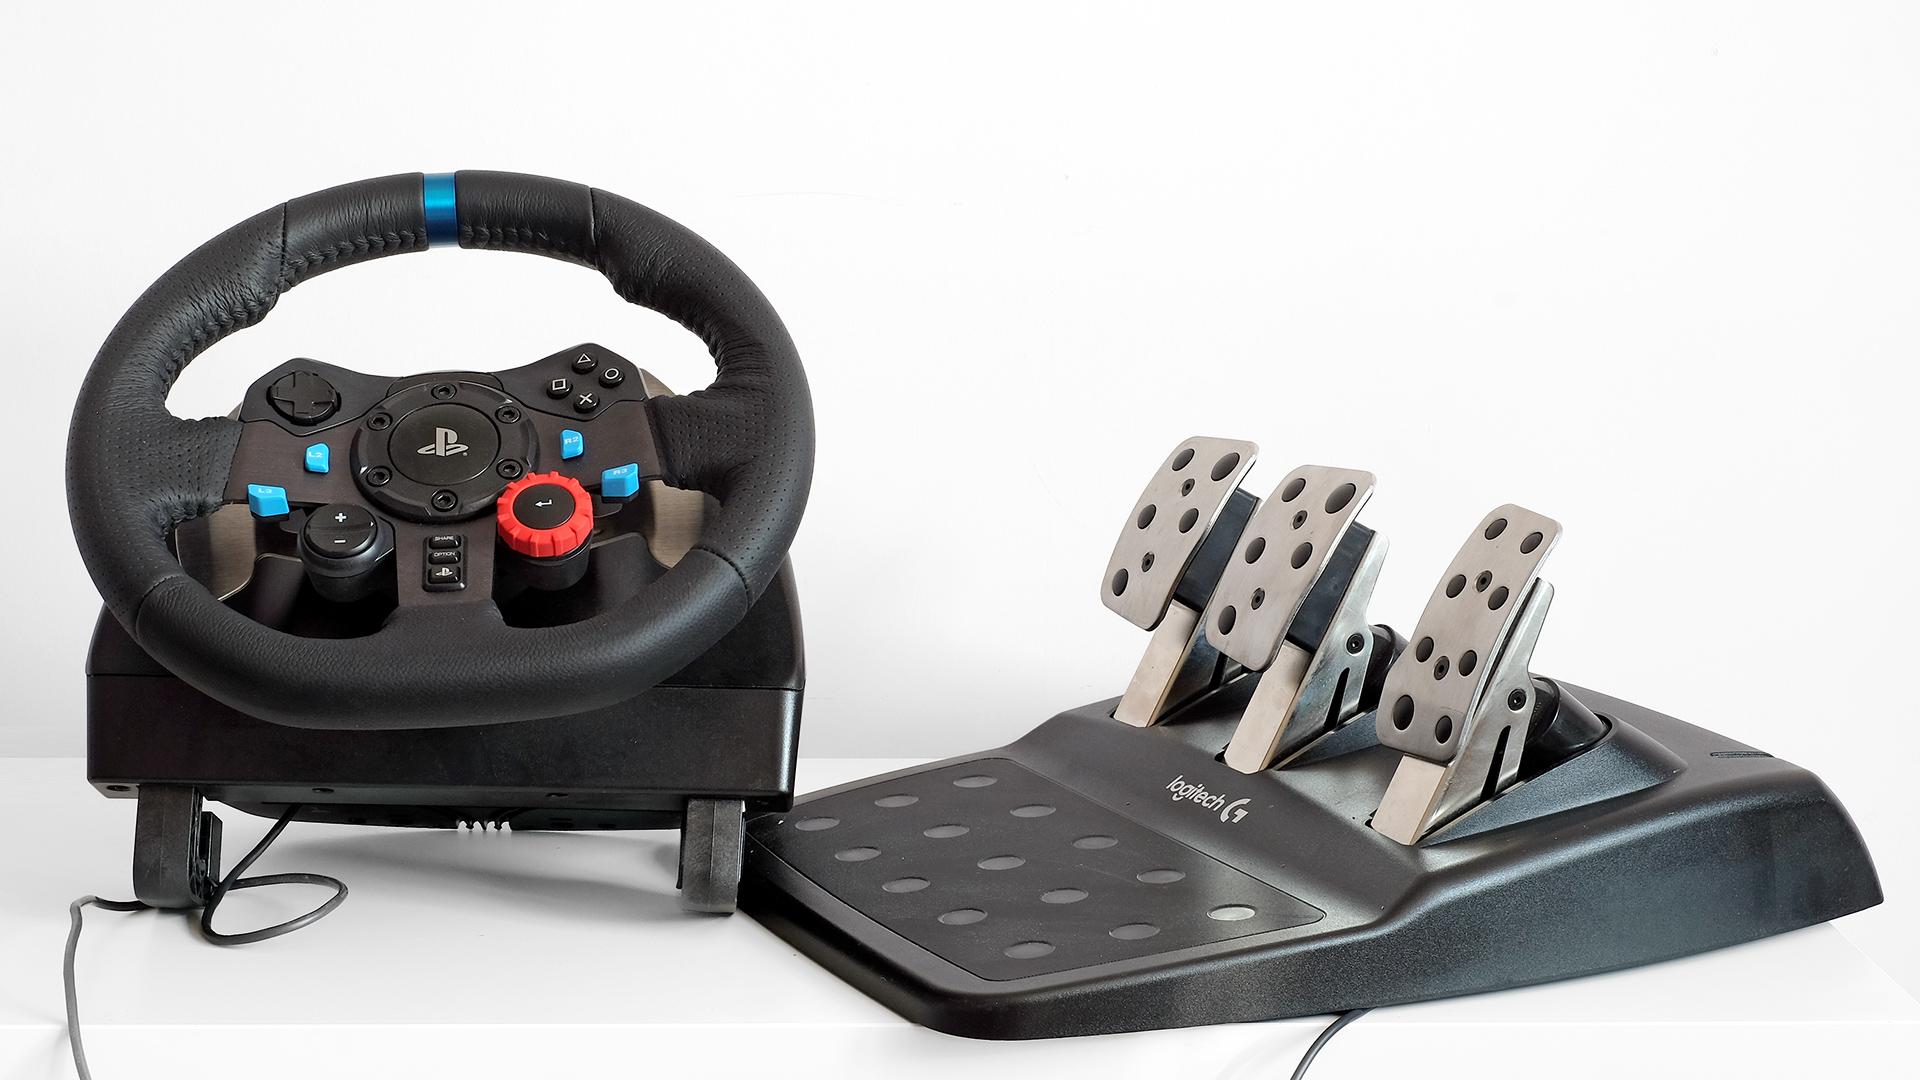 Best racing wheel: Logitech vs Thrustmaster vs Fanatec vs Hori